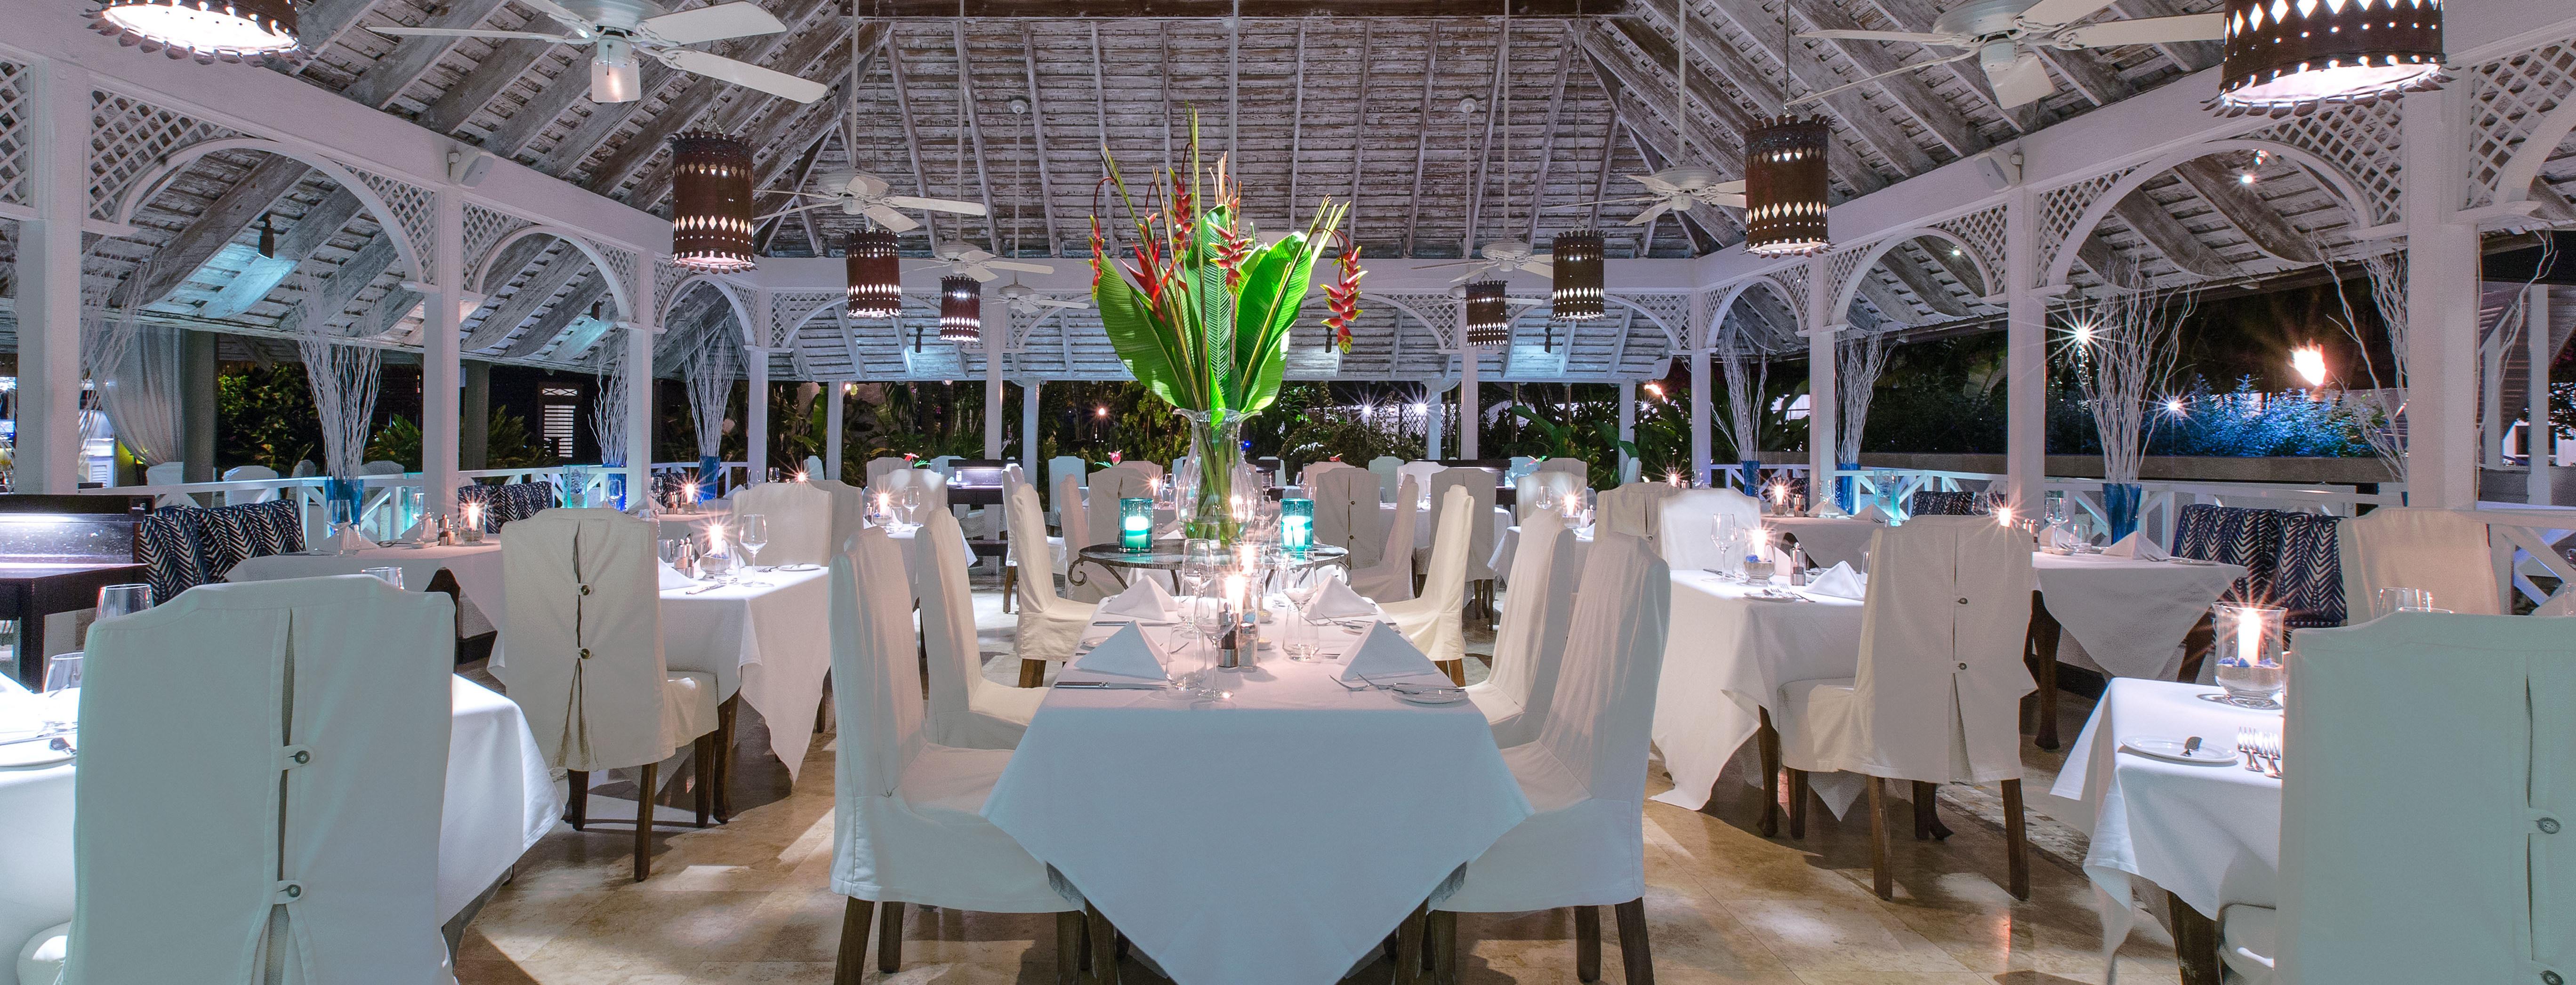 the-sandpiper-restaurant-interior